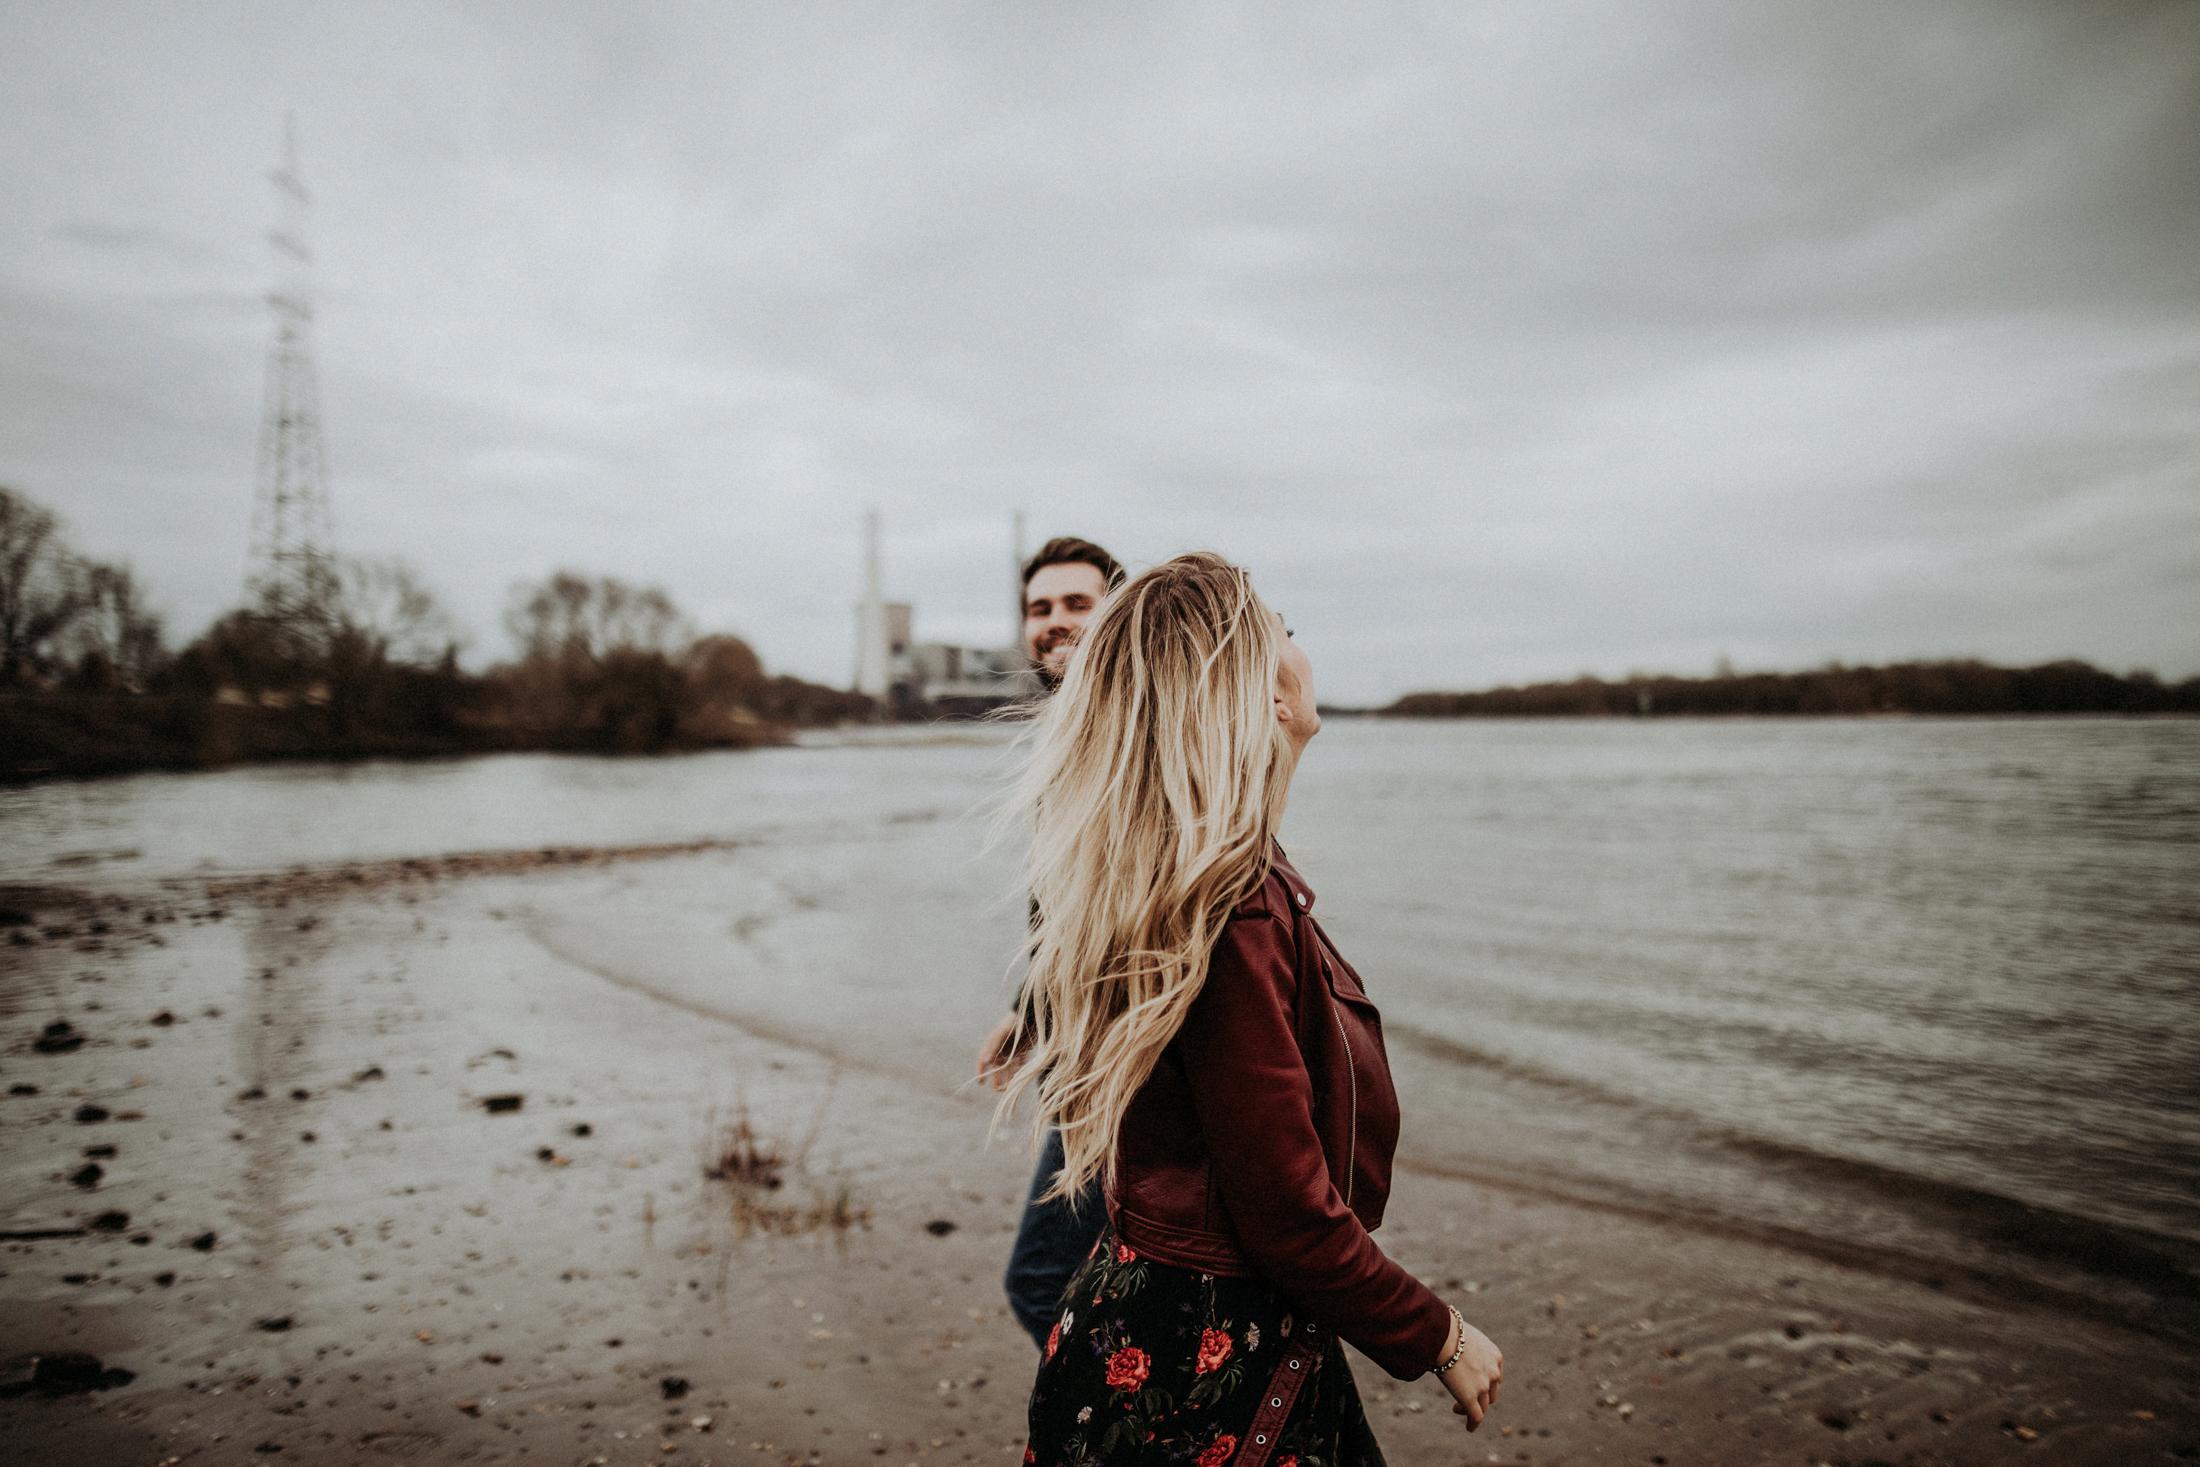 Wedding_Photographer_Mallorca_DanielaMarquardt_Photography_CanaryIslands_Lanzarote_Iceland_Tuscany_Santorini_Portugal_NewYork_Spain_Elopement_Hochzeitsfotograf_CK50